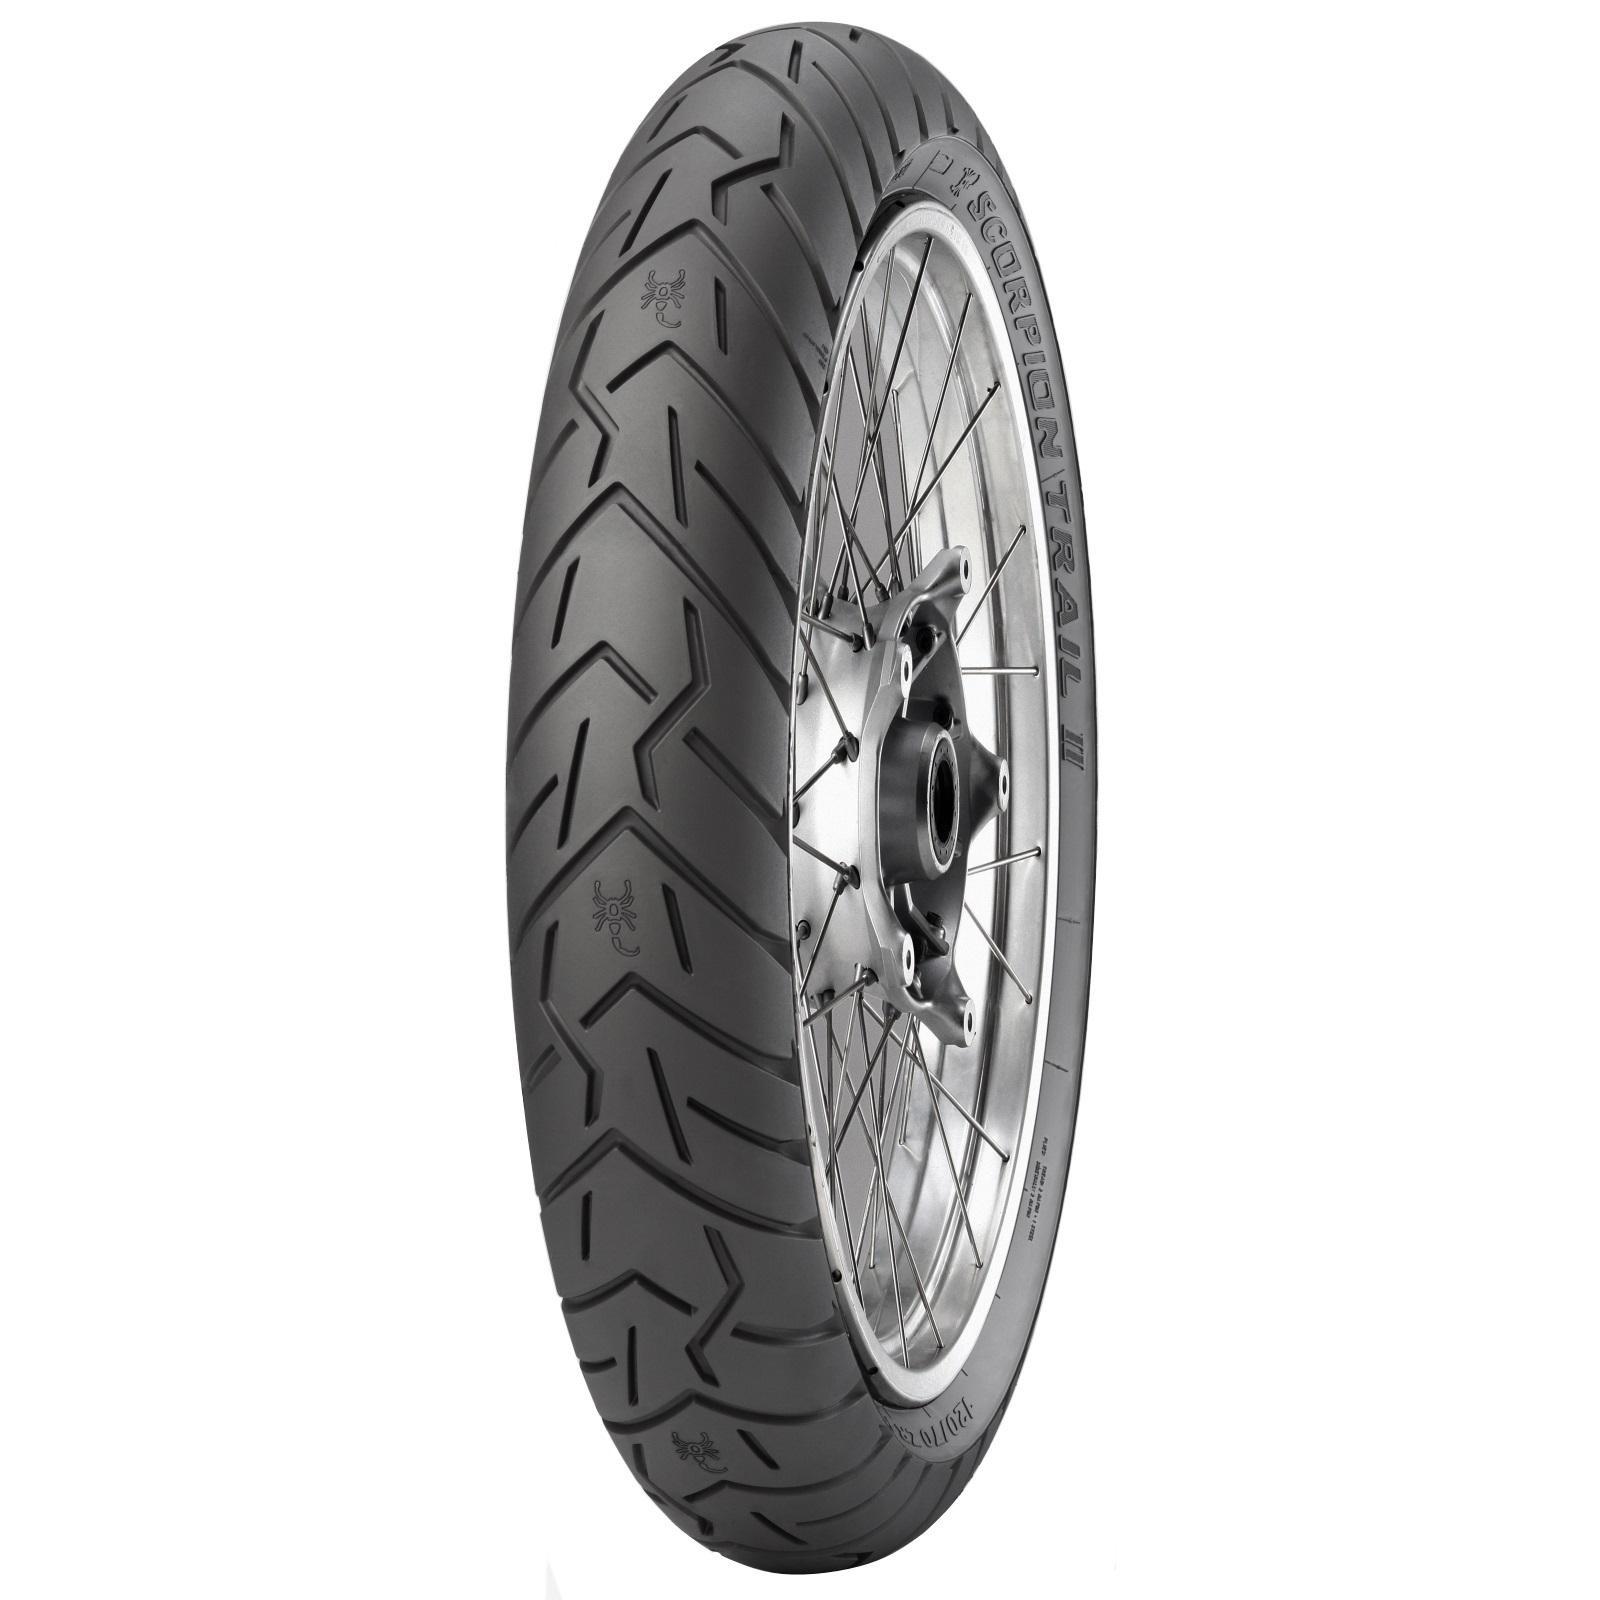 Pirelli Scorpion Trail II 120/70 ZR 19 Tubeless 60 V Front Two-Wheeler Tyre